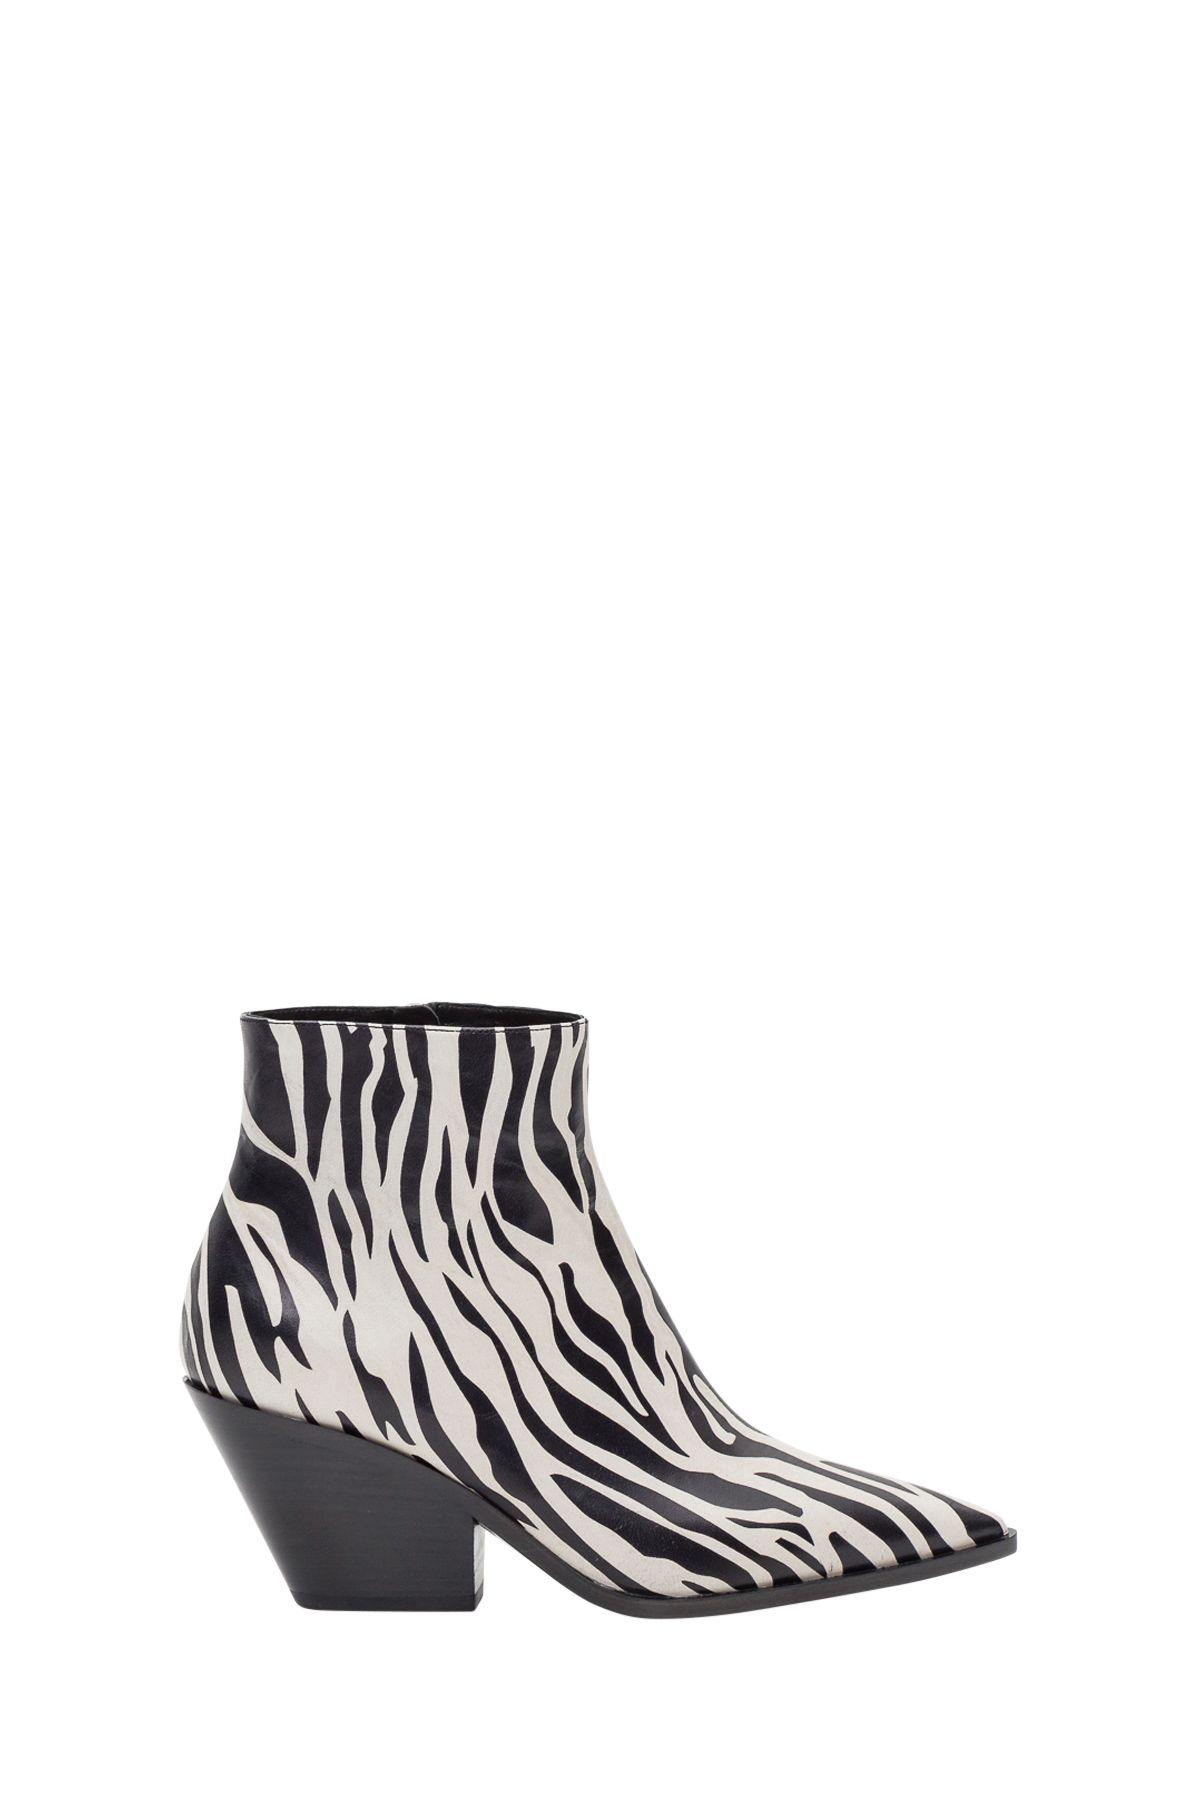 casadei -  Zebra Western Boots